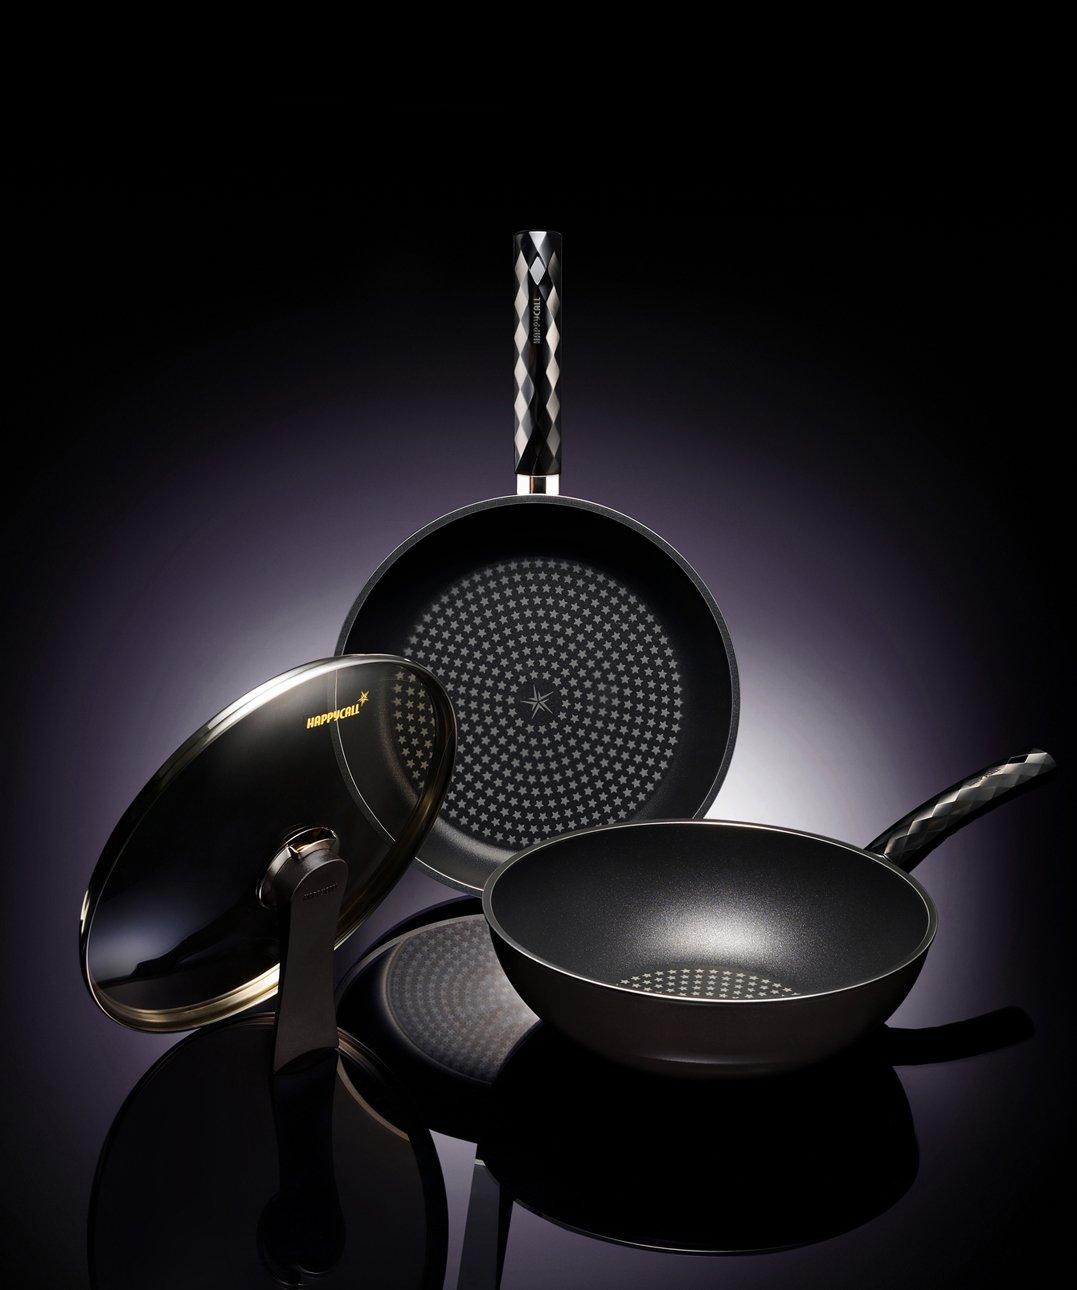 Happycall 5 Layer Diamond Nonstick Pan and Wok 3-piece Set, 12inch, PFOA-Free, Cookware Set, Dark Brown